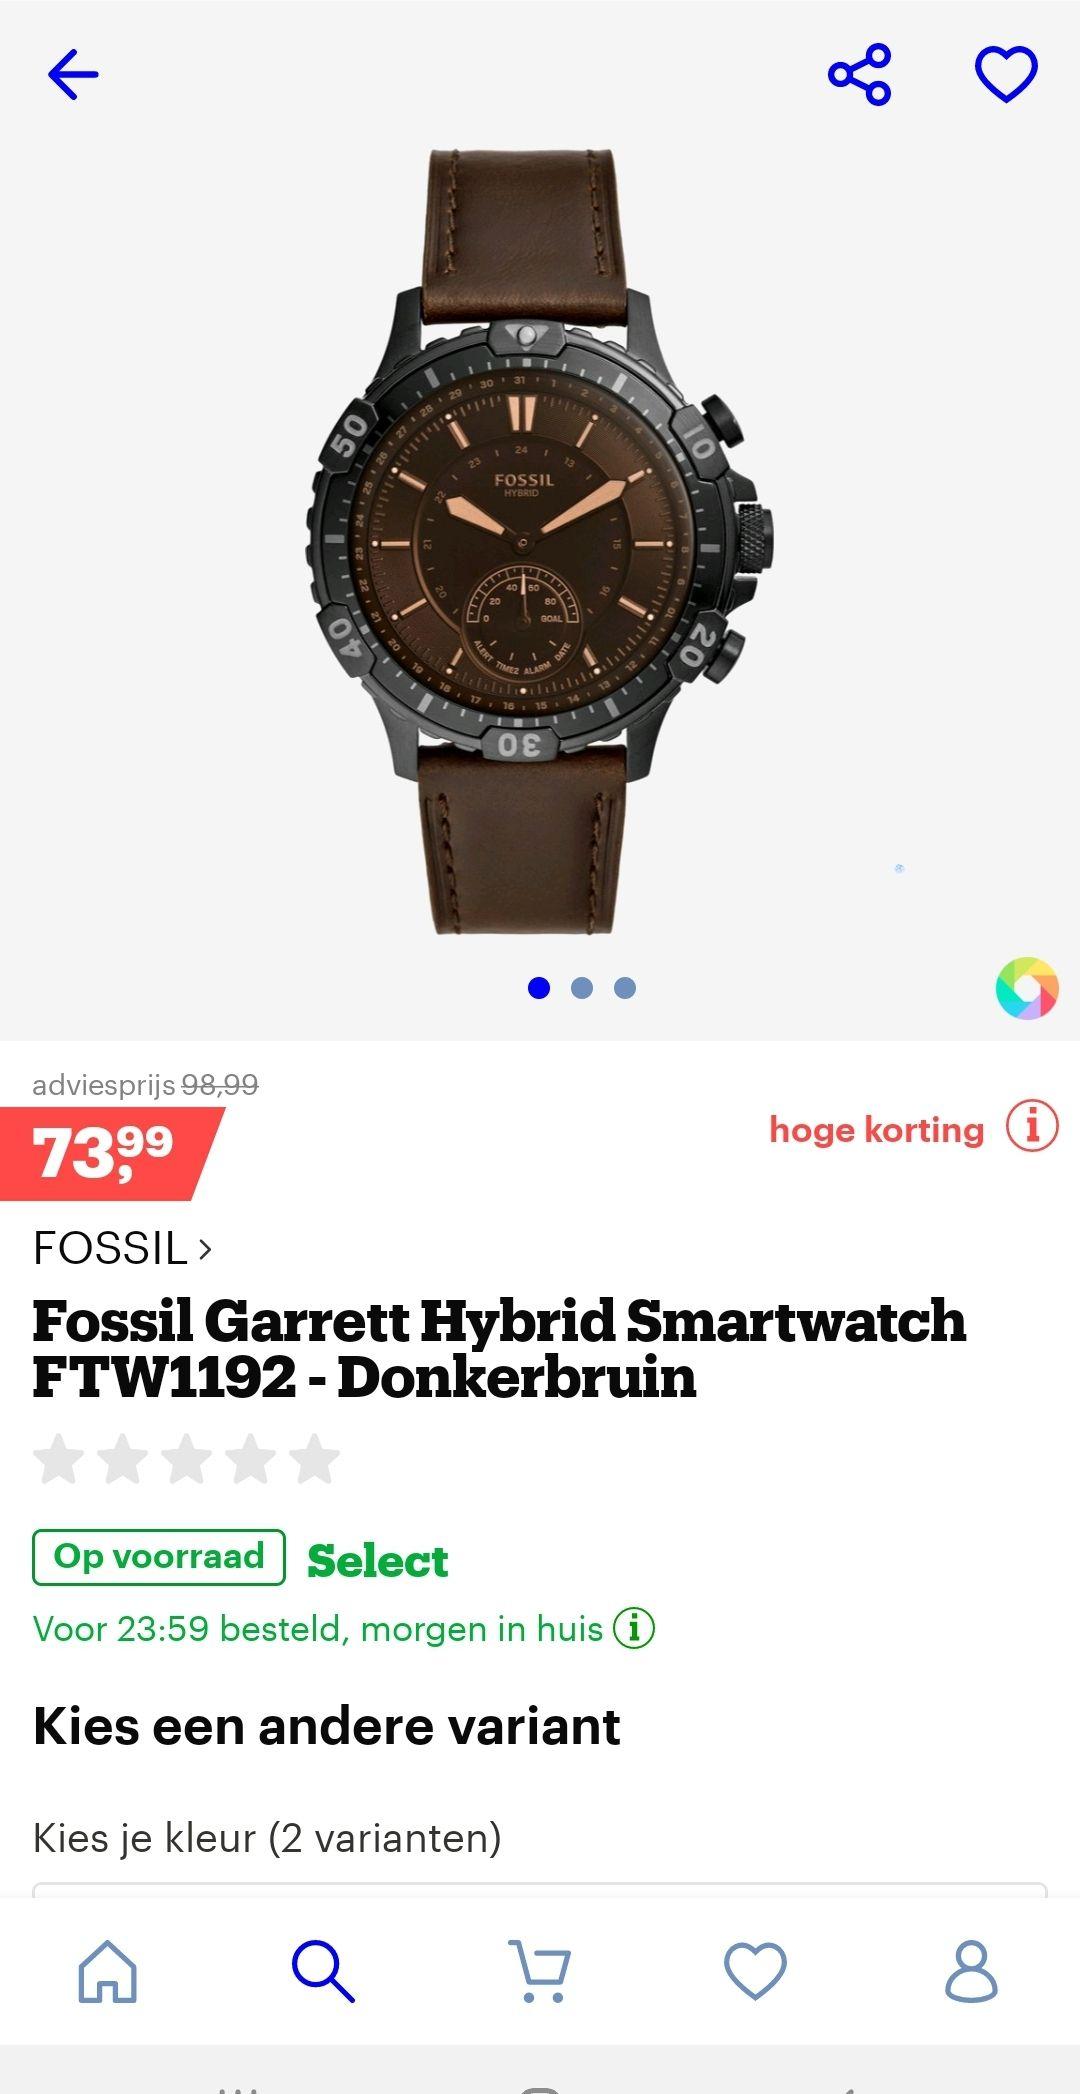 Fossil garrett hybrid ftw 1191